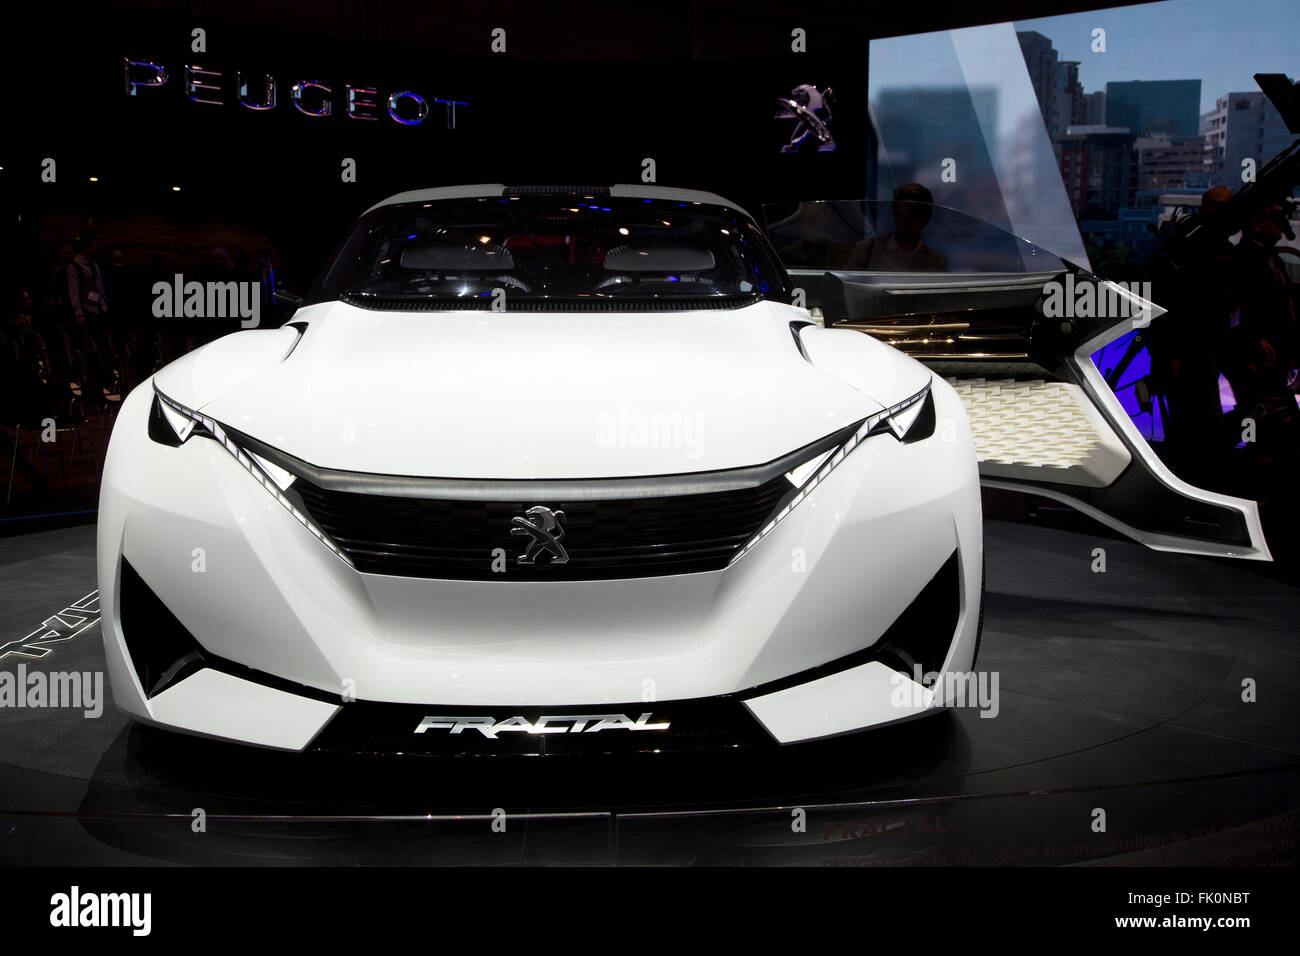 Peugeot Fractal Concept Car at the Geneva Motor Show 2016 - Stock Image